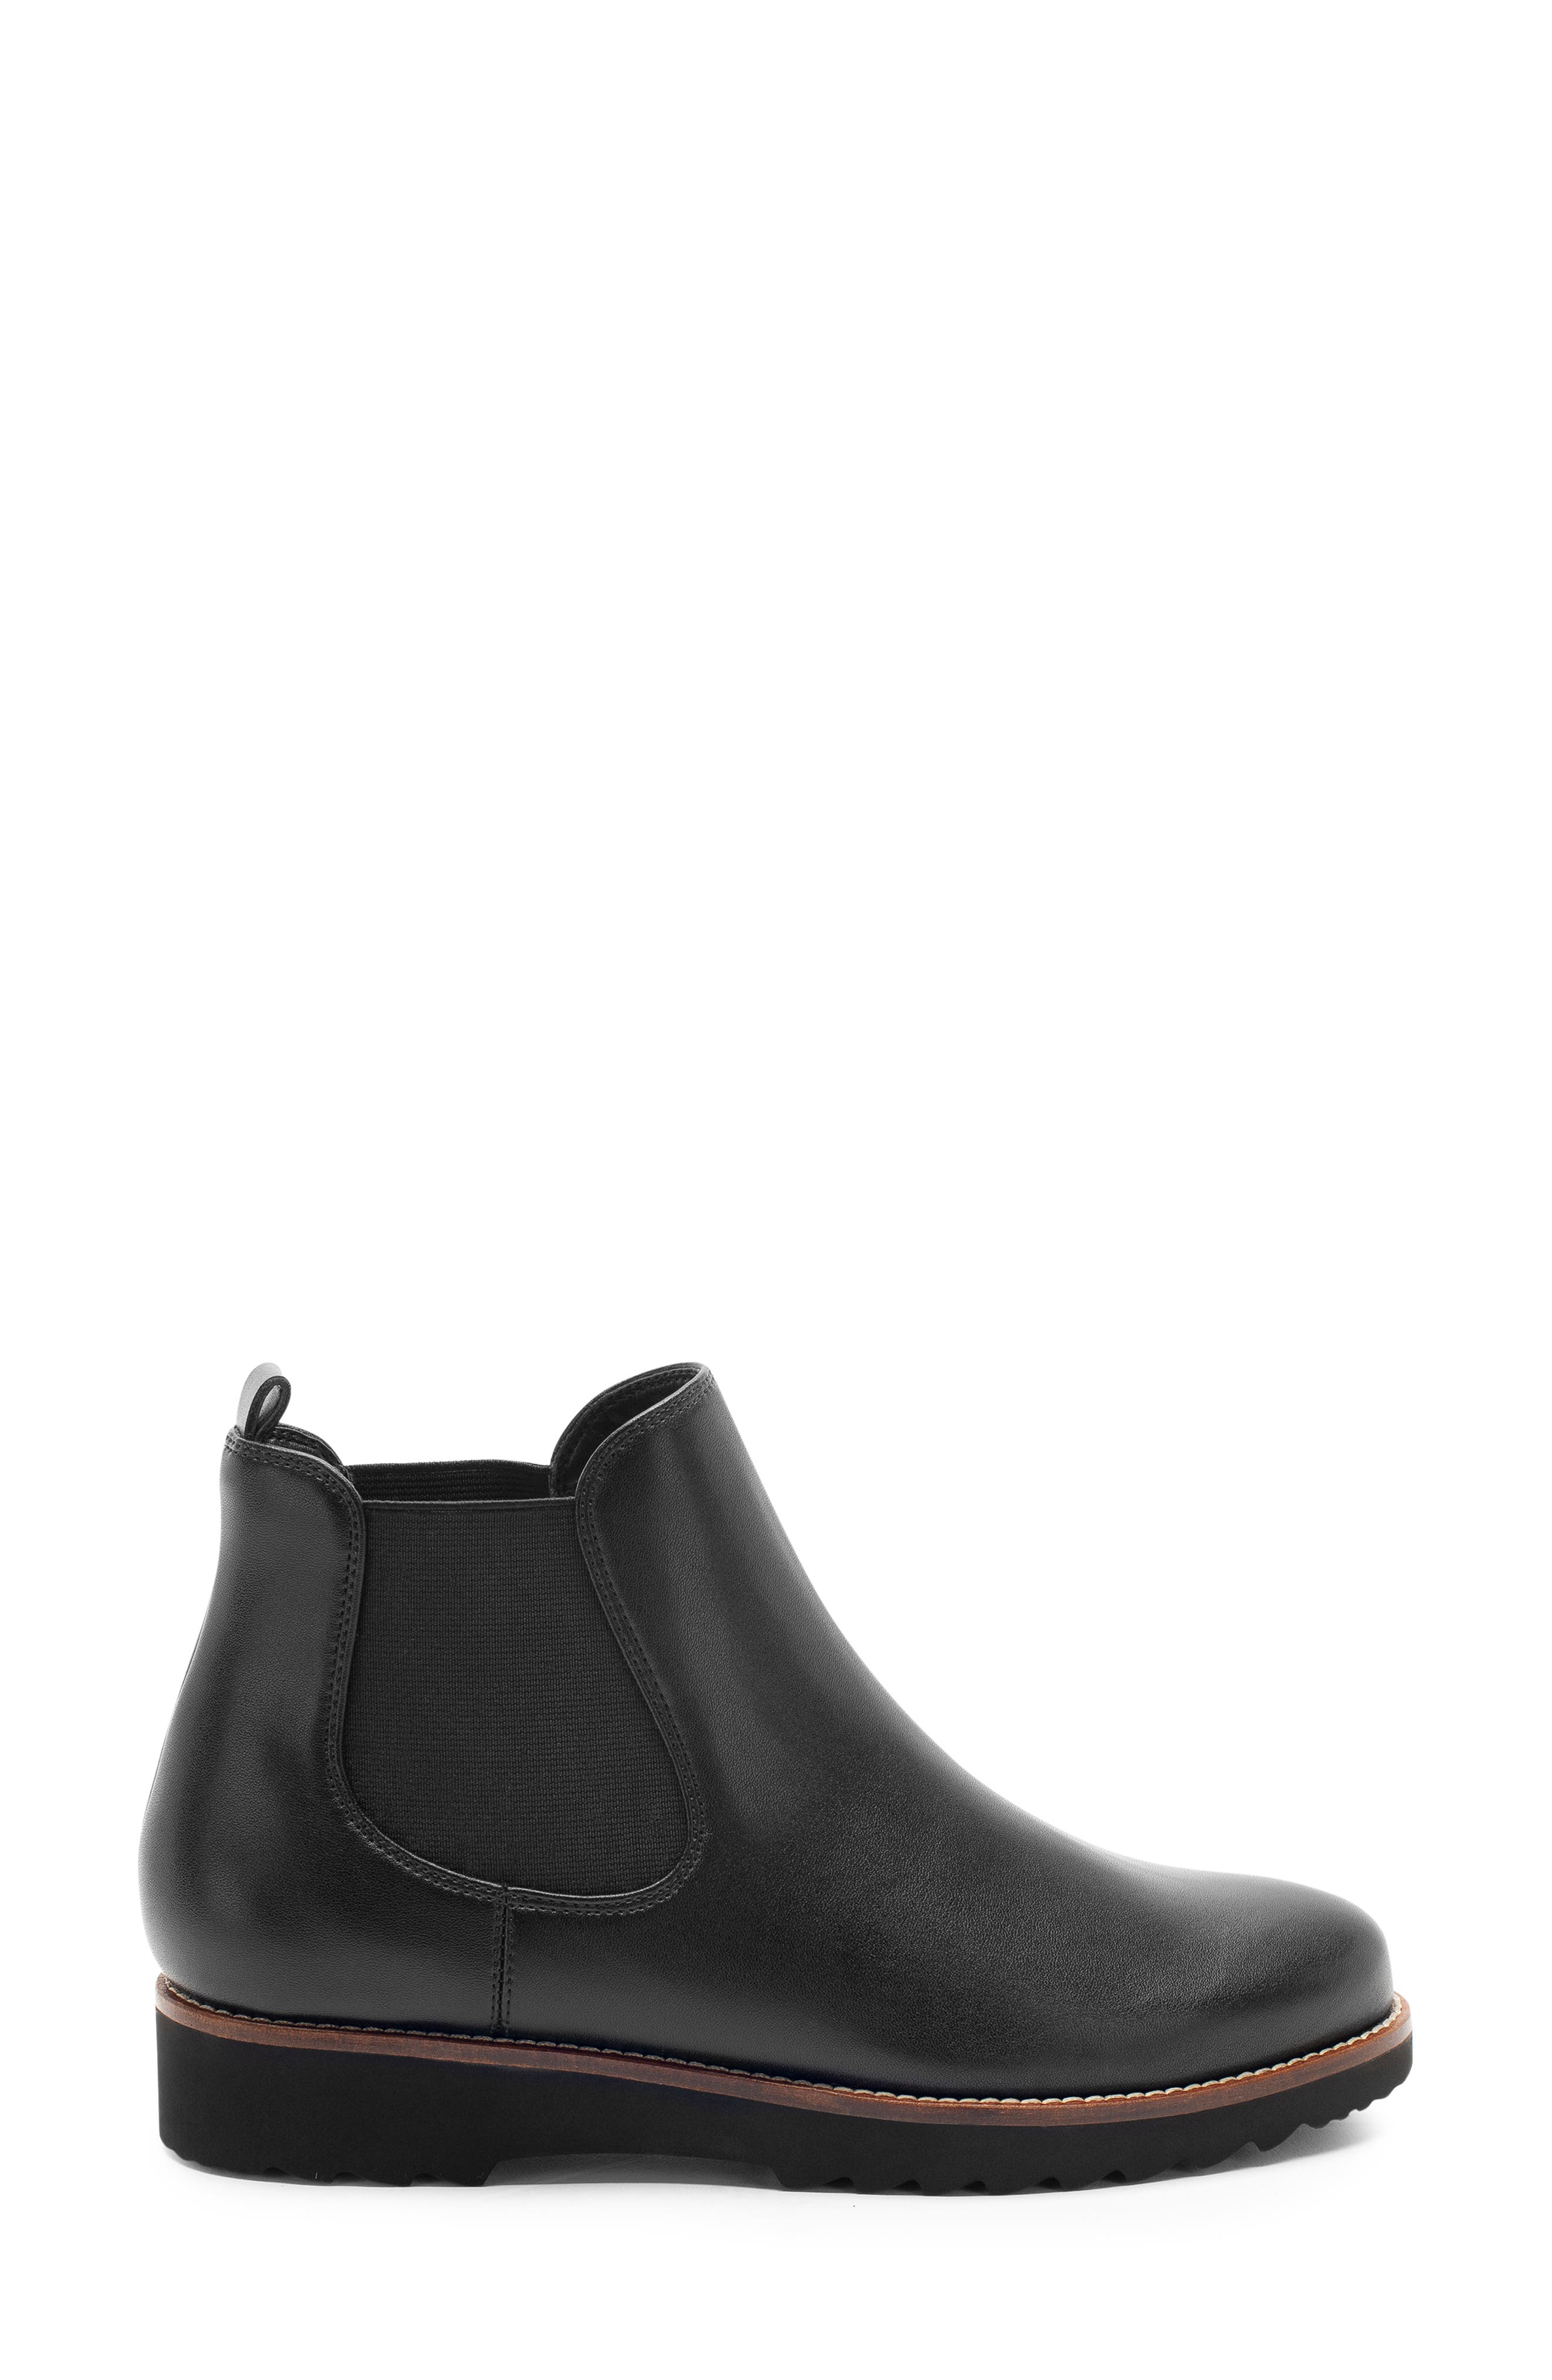 Roman Waterproof Bootie,                             Alternate thumbnail 3, color,                             Black Leather